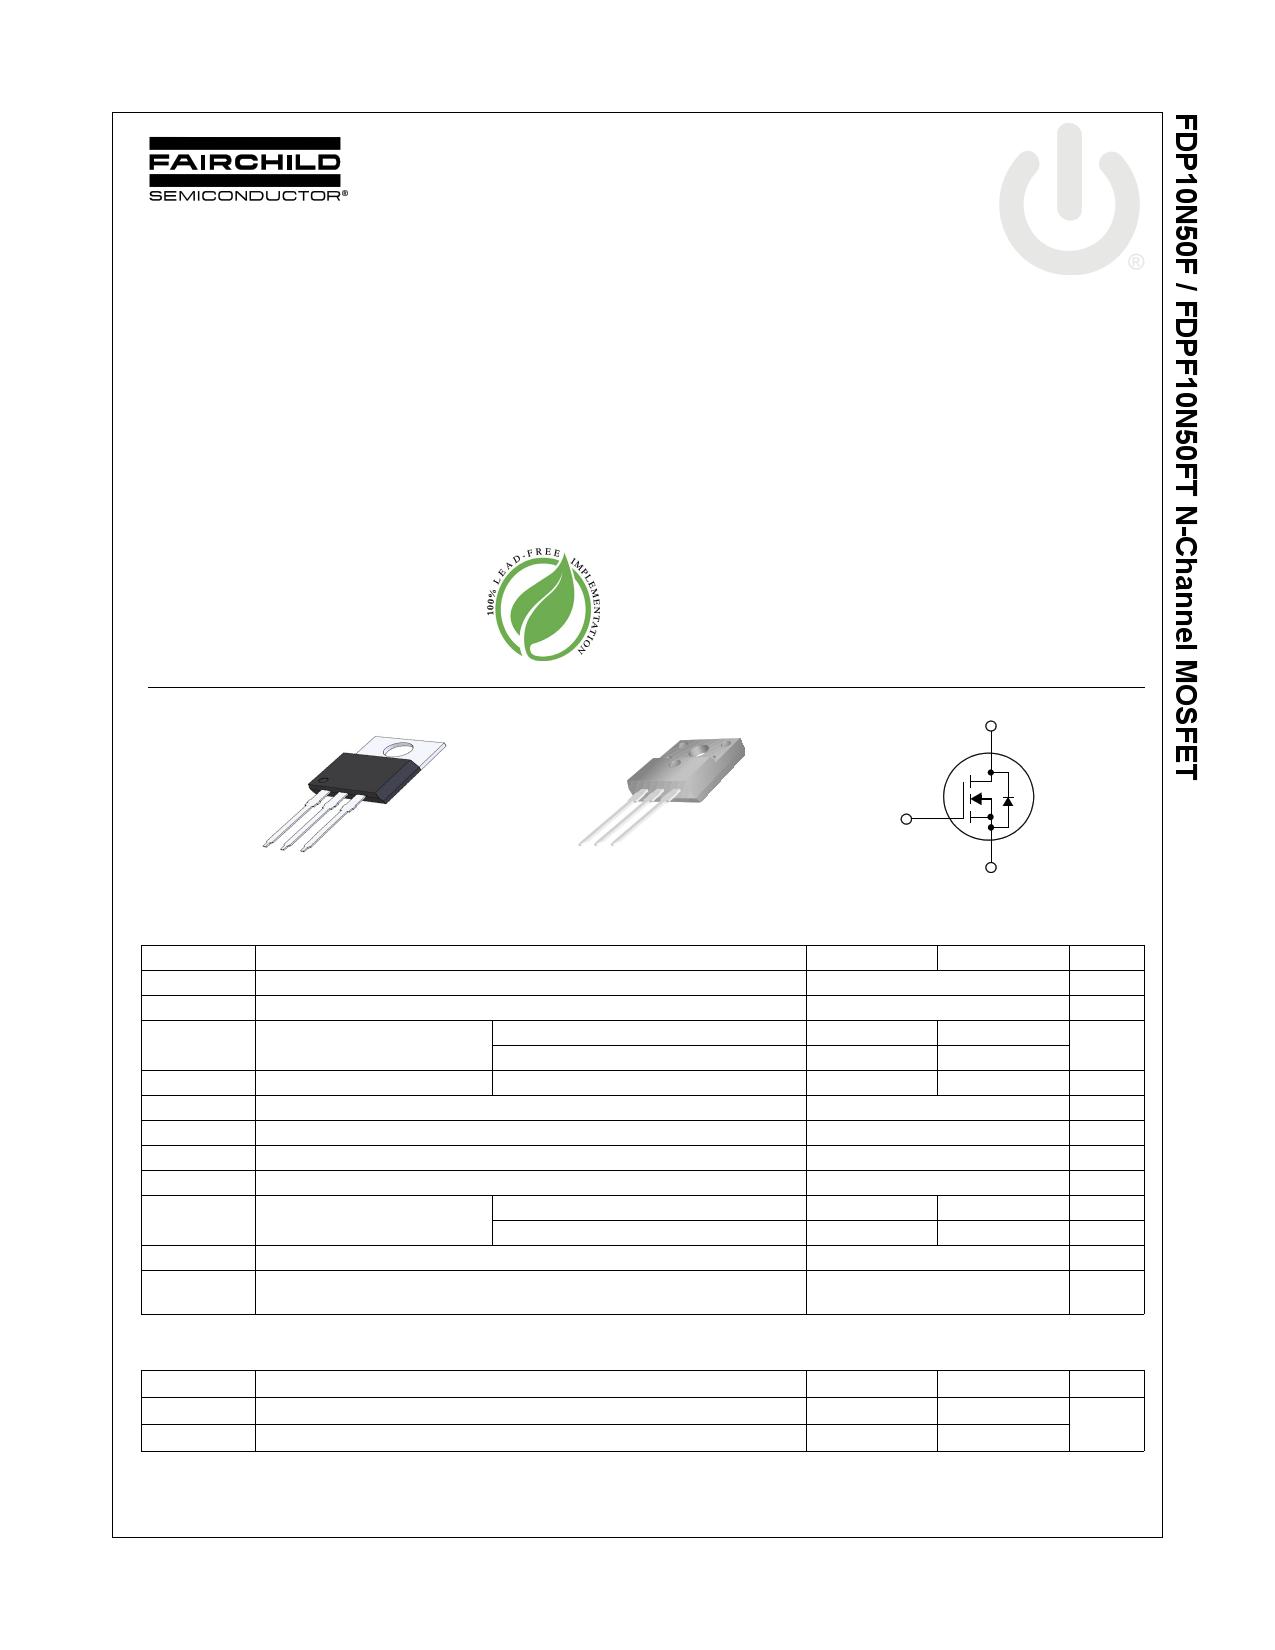 FDPF10N50FT 데이터시트 및 FDPF10N50FT PDF